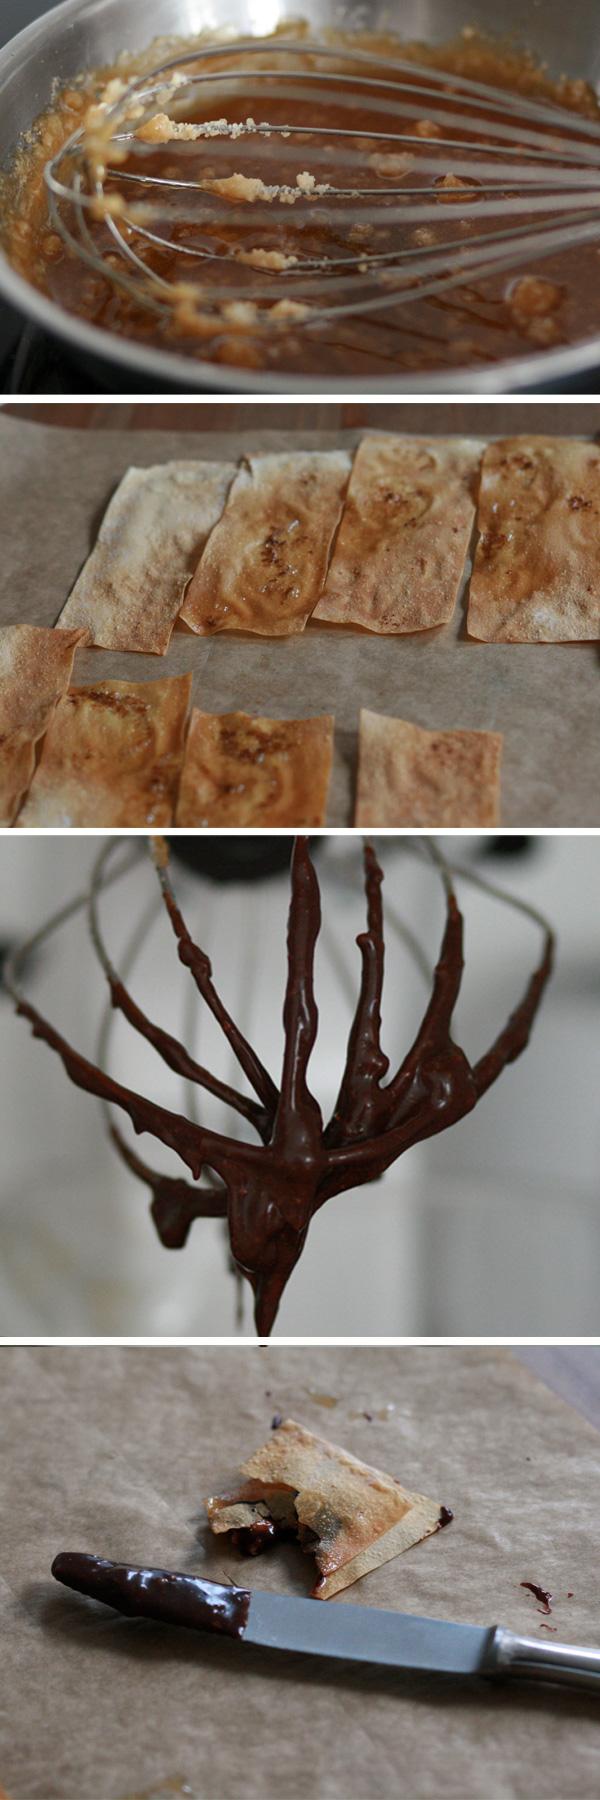 erdnuss_schokoladen